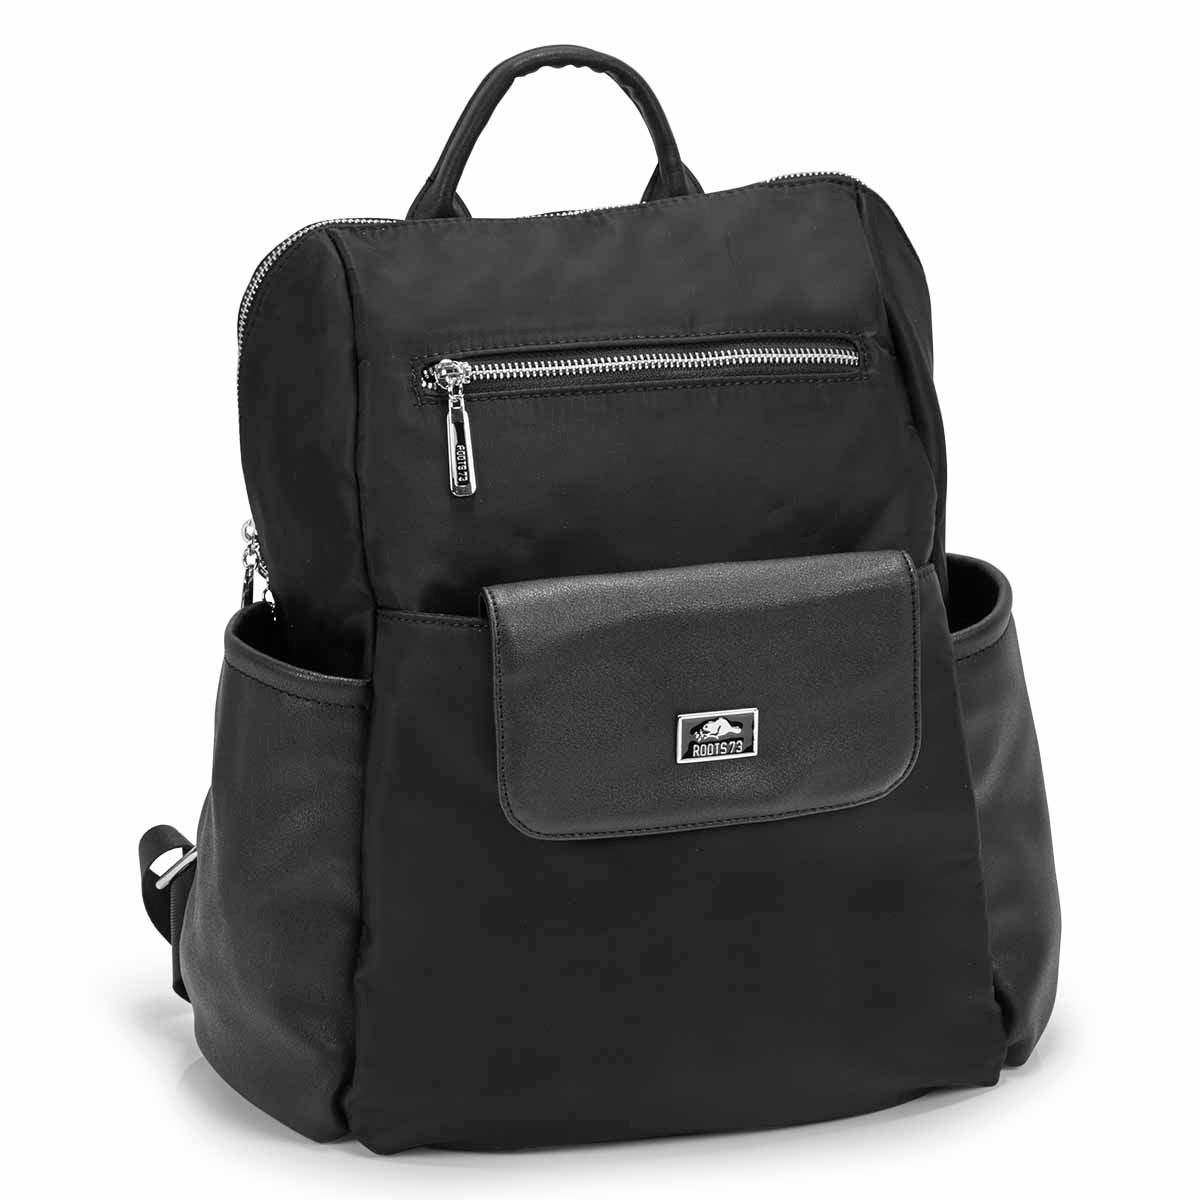 Women's R5454 black 2 in 1 backpack